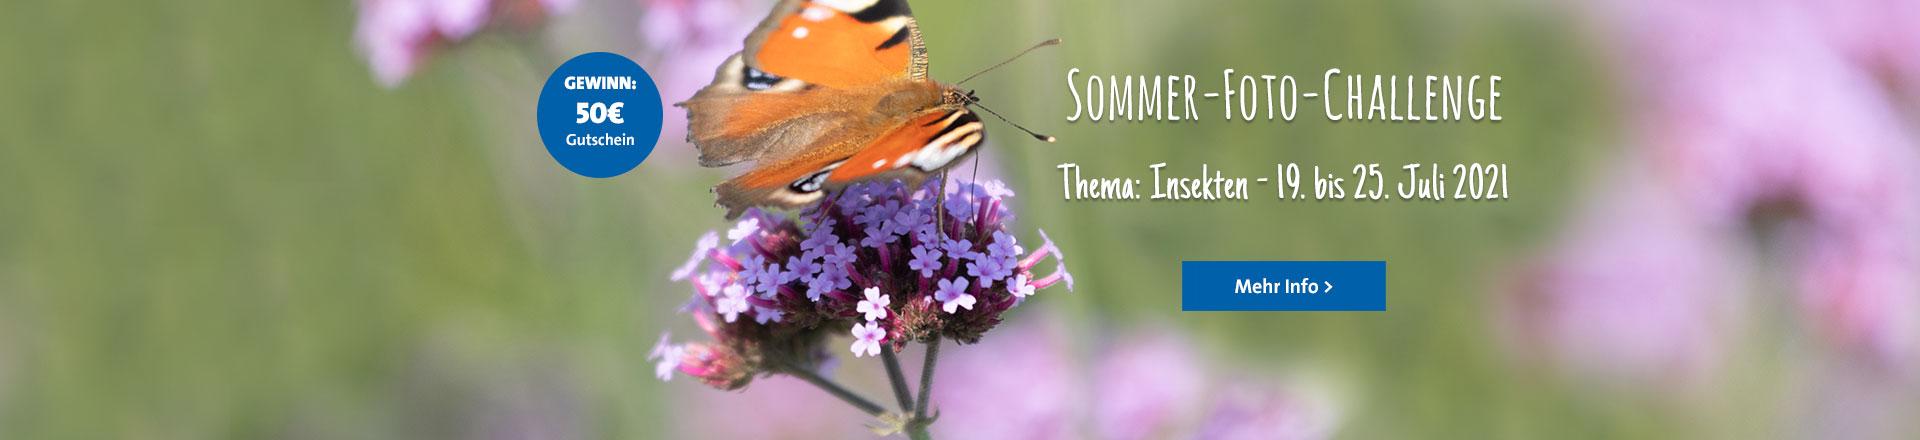 Sommer-Foto-Challenge